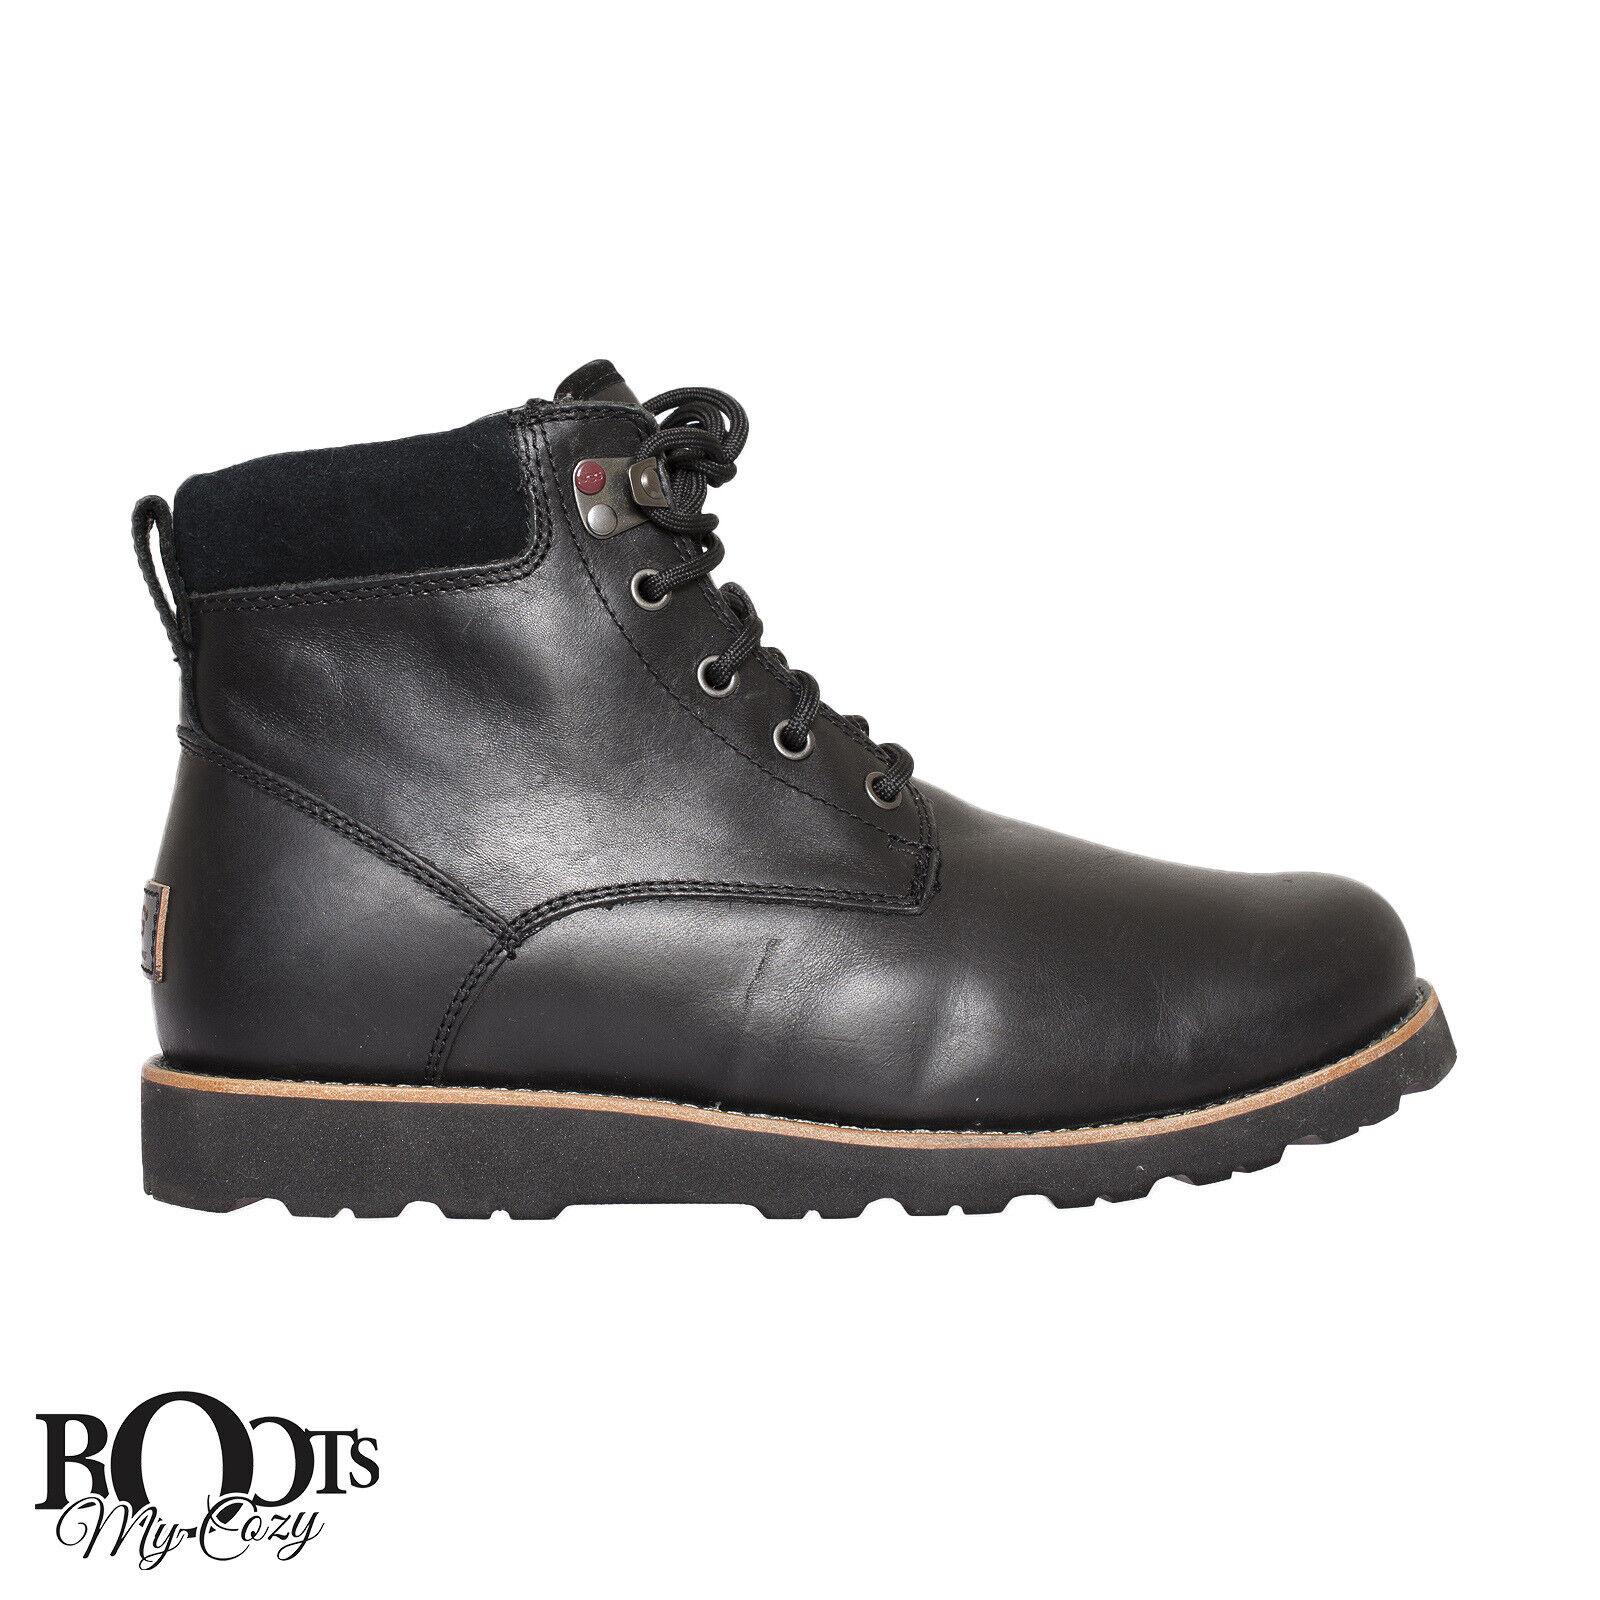 86621680553 UGG Seton TL Mens 1008146-blk Black Leather Treadlite Waterproof BOOTS Size  11